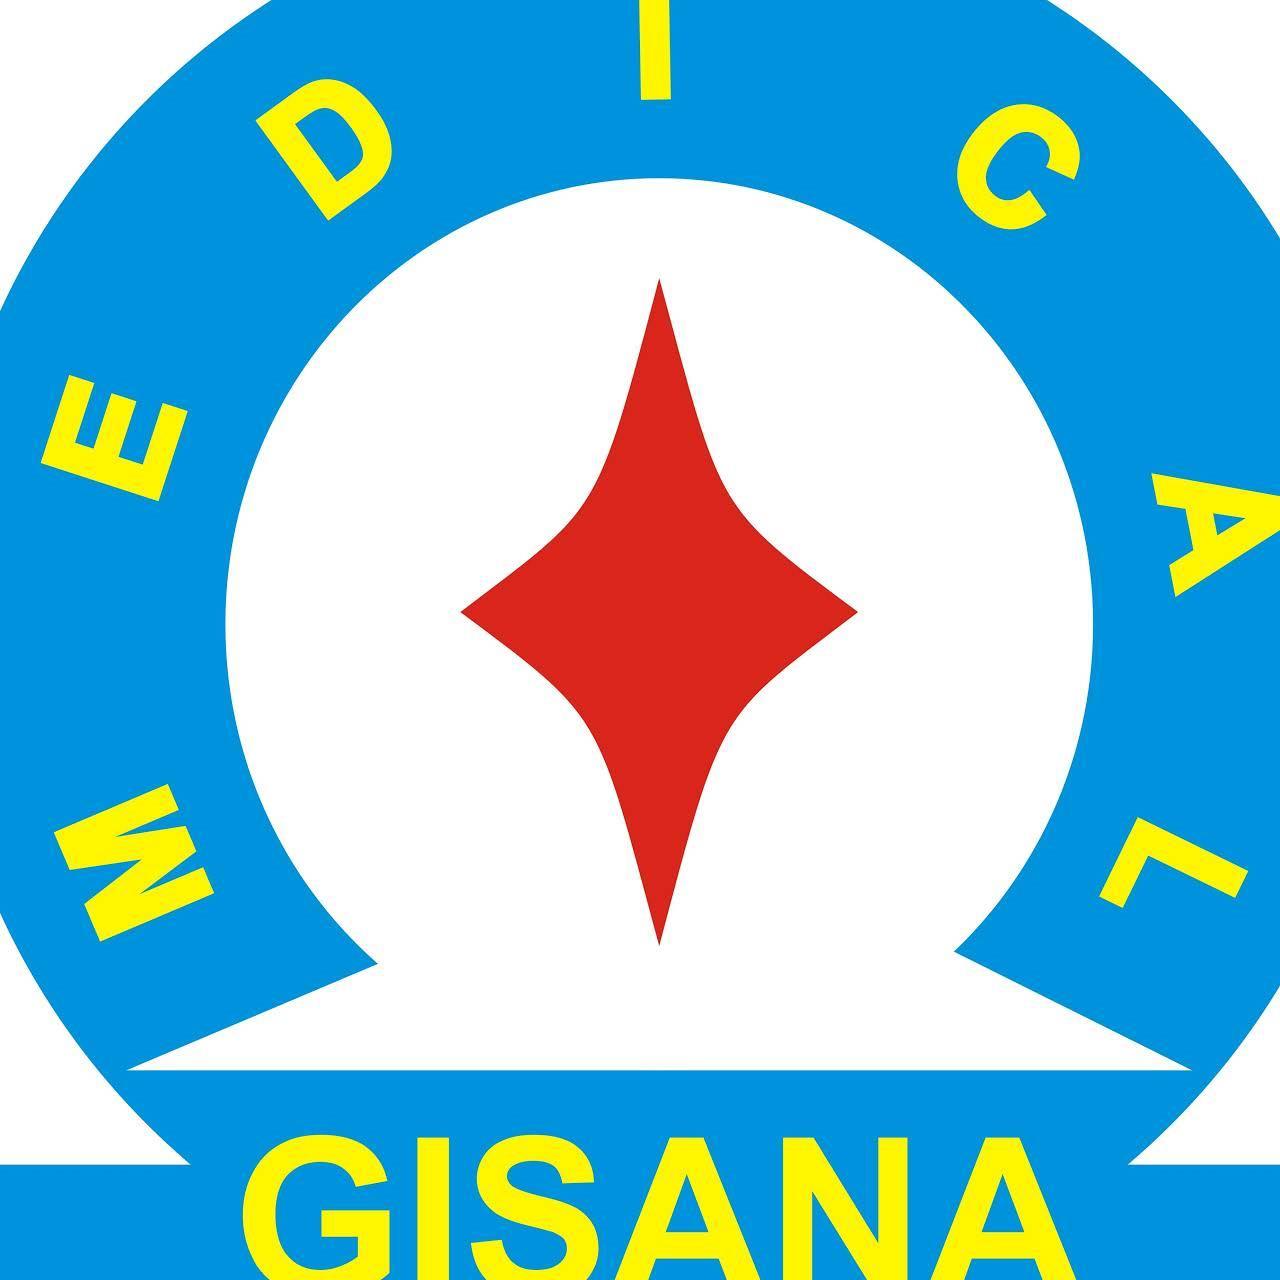 Clinica Gisana Medical